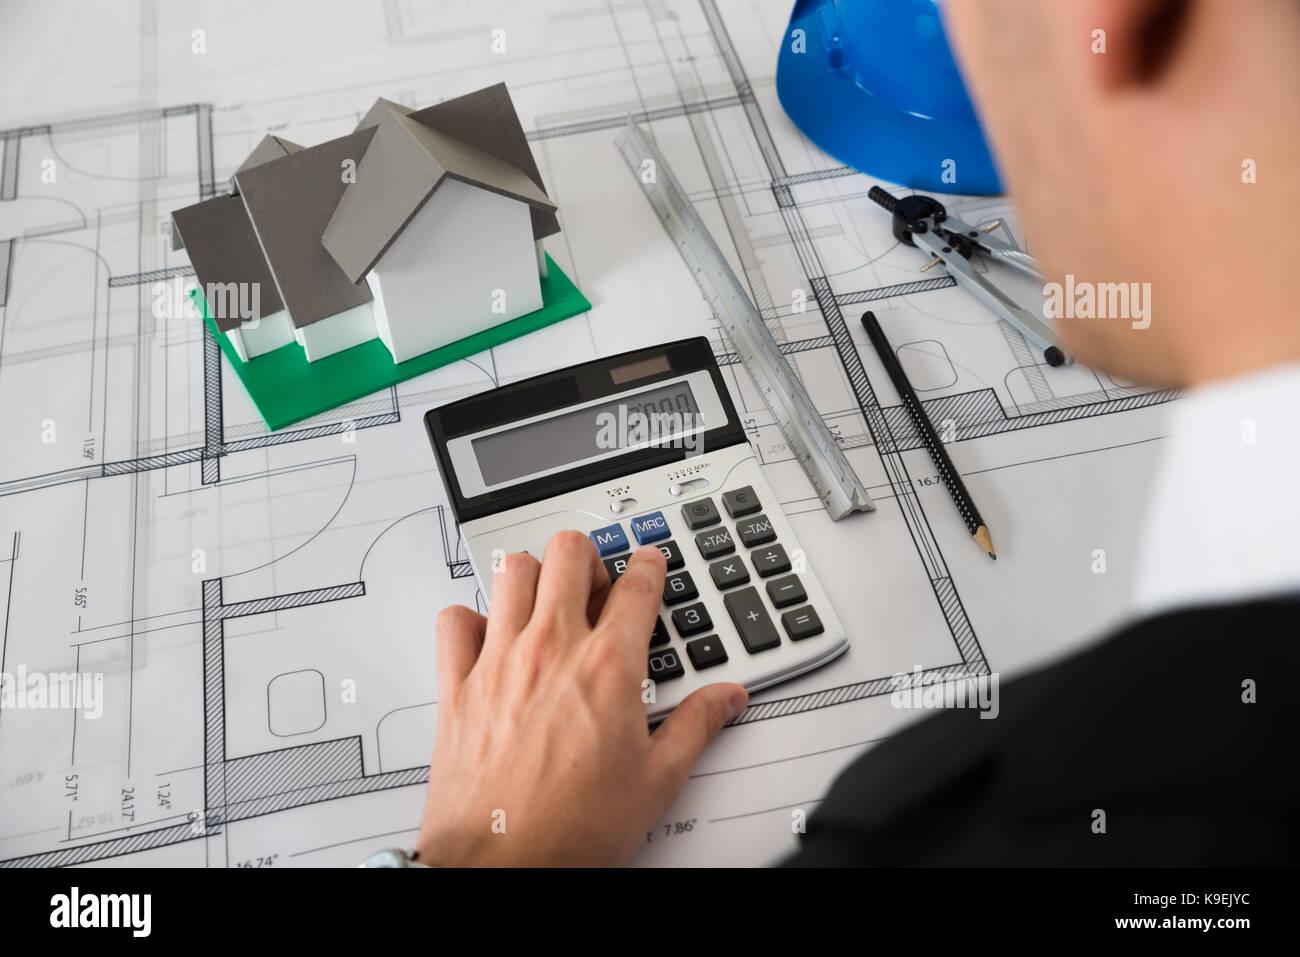 Engineering office and calculator stock photos for Blueprint estimator